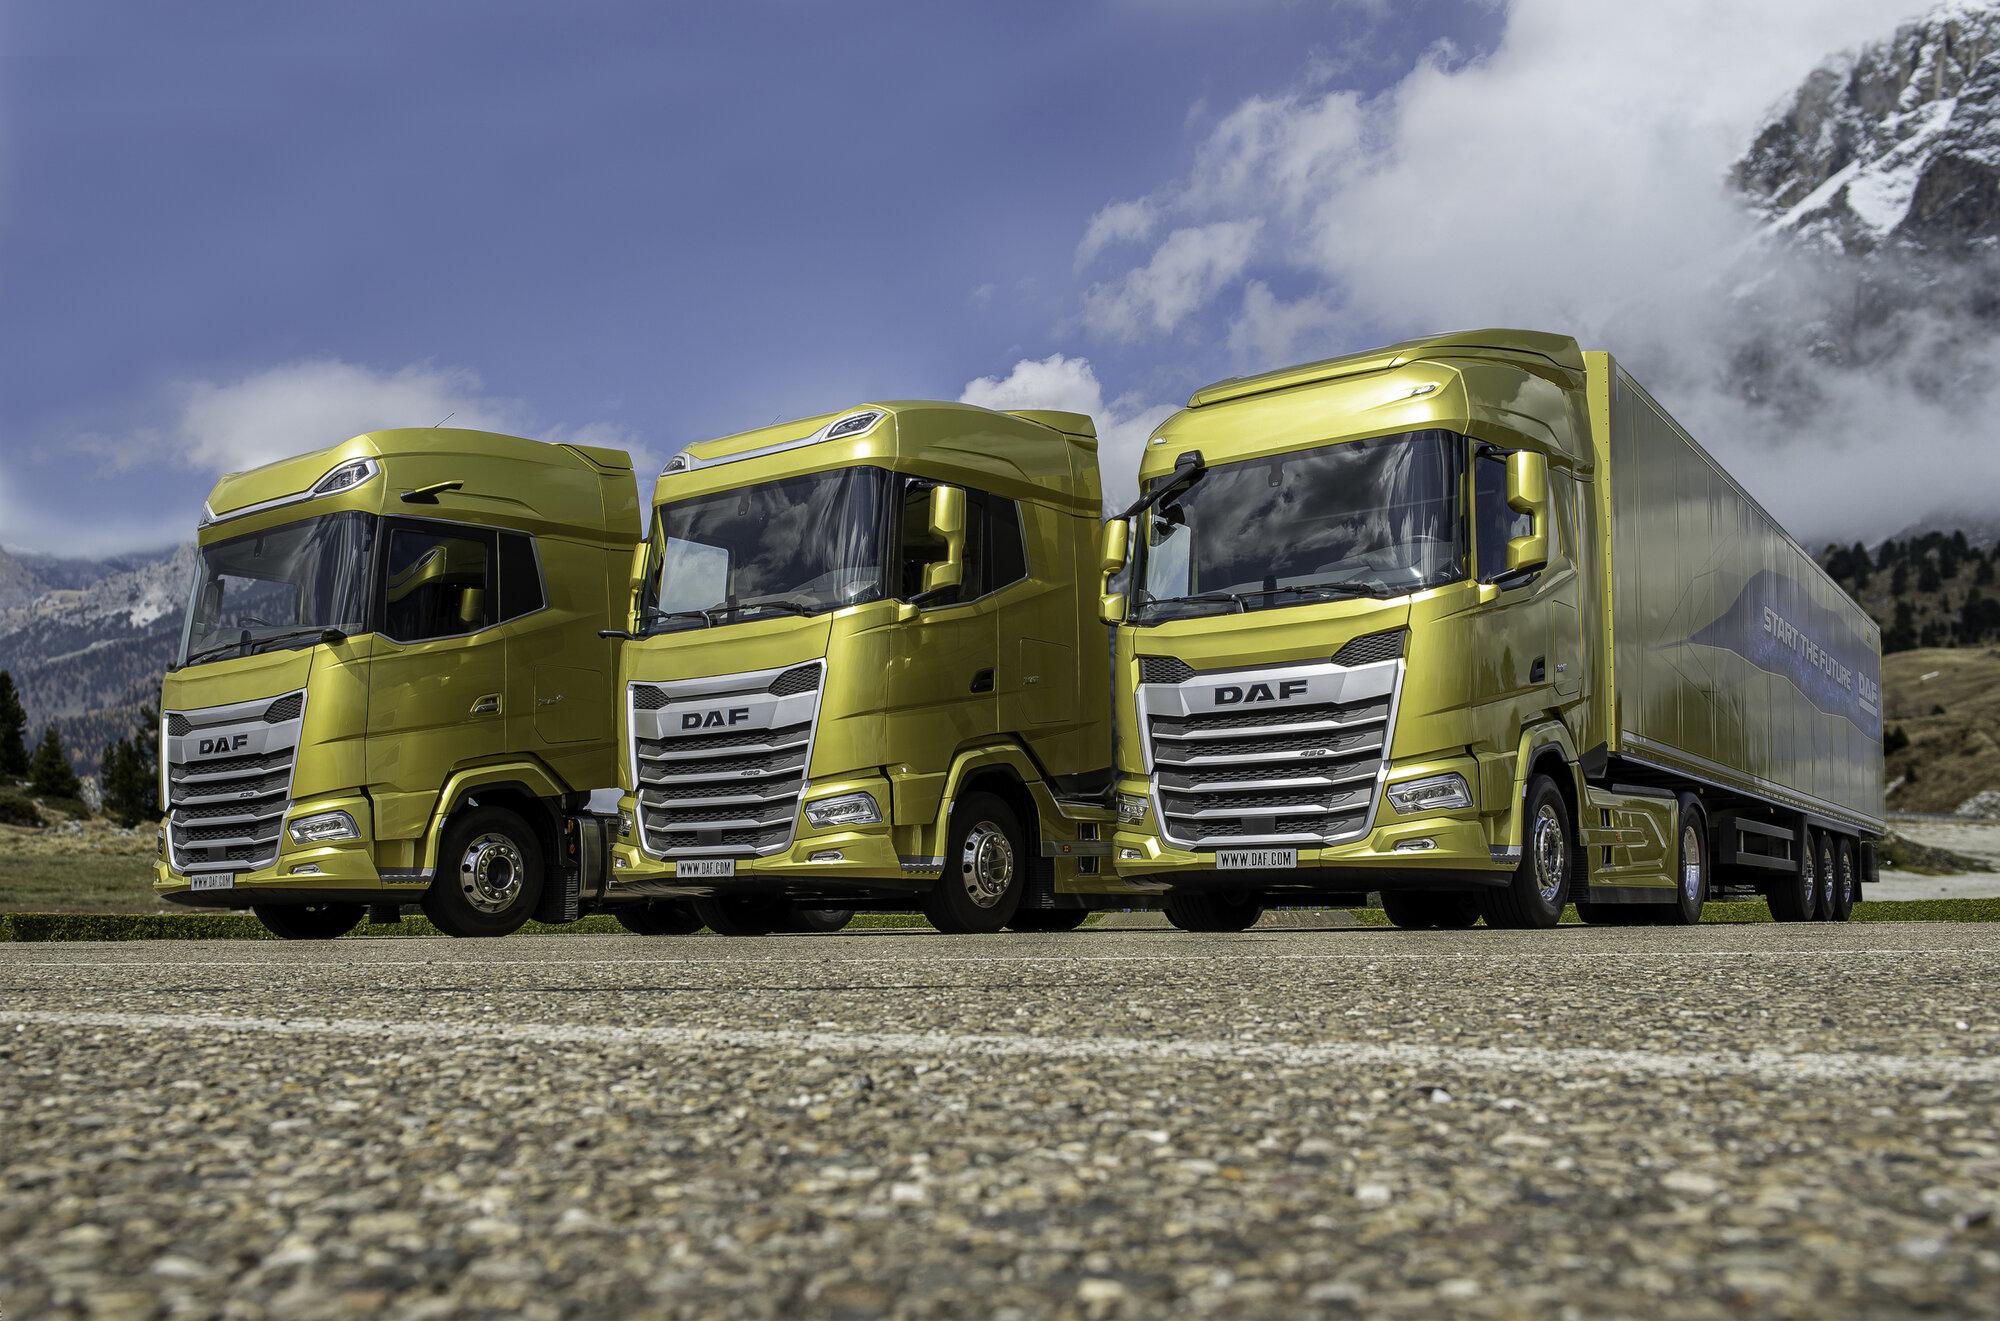 01-the-new-generation-daf-trucks-2021-fr